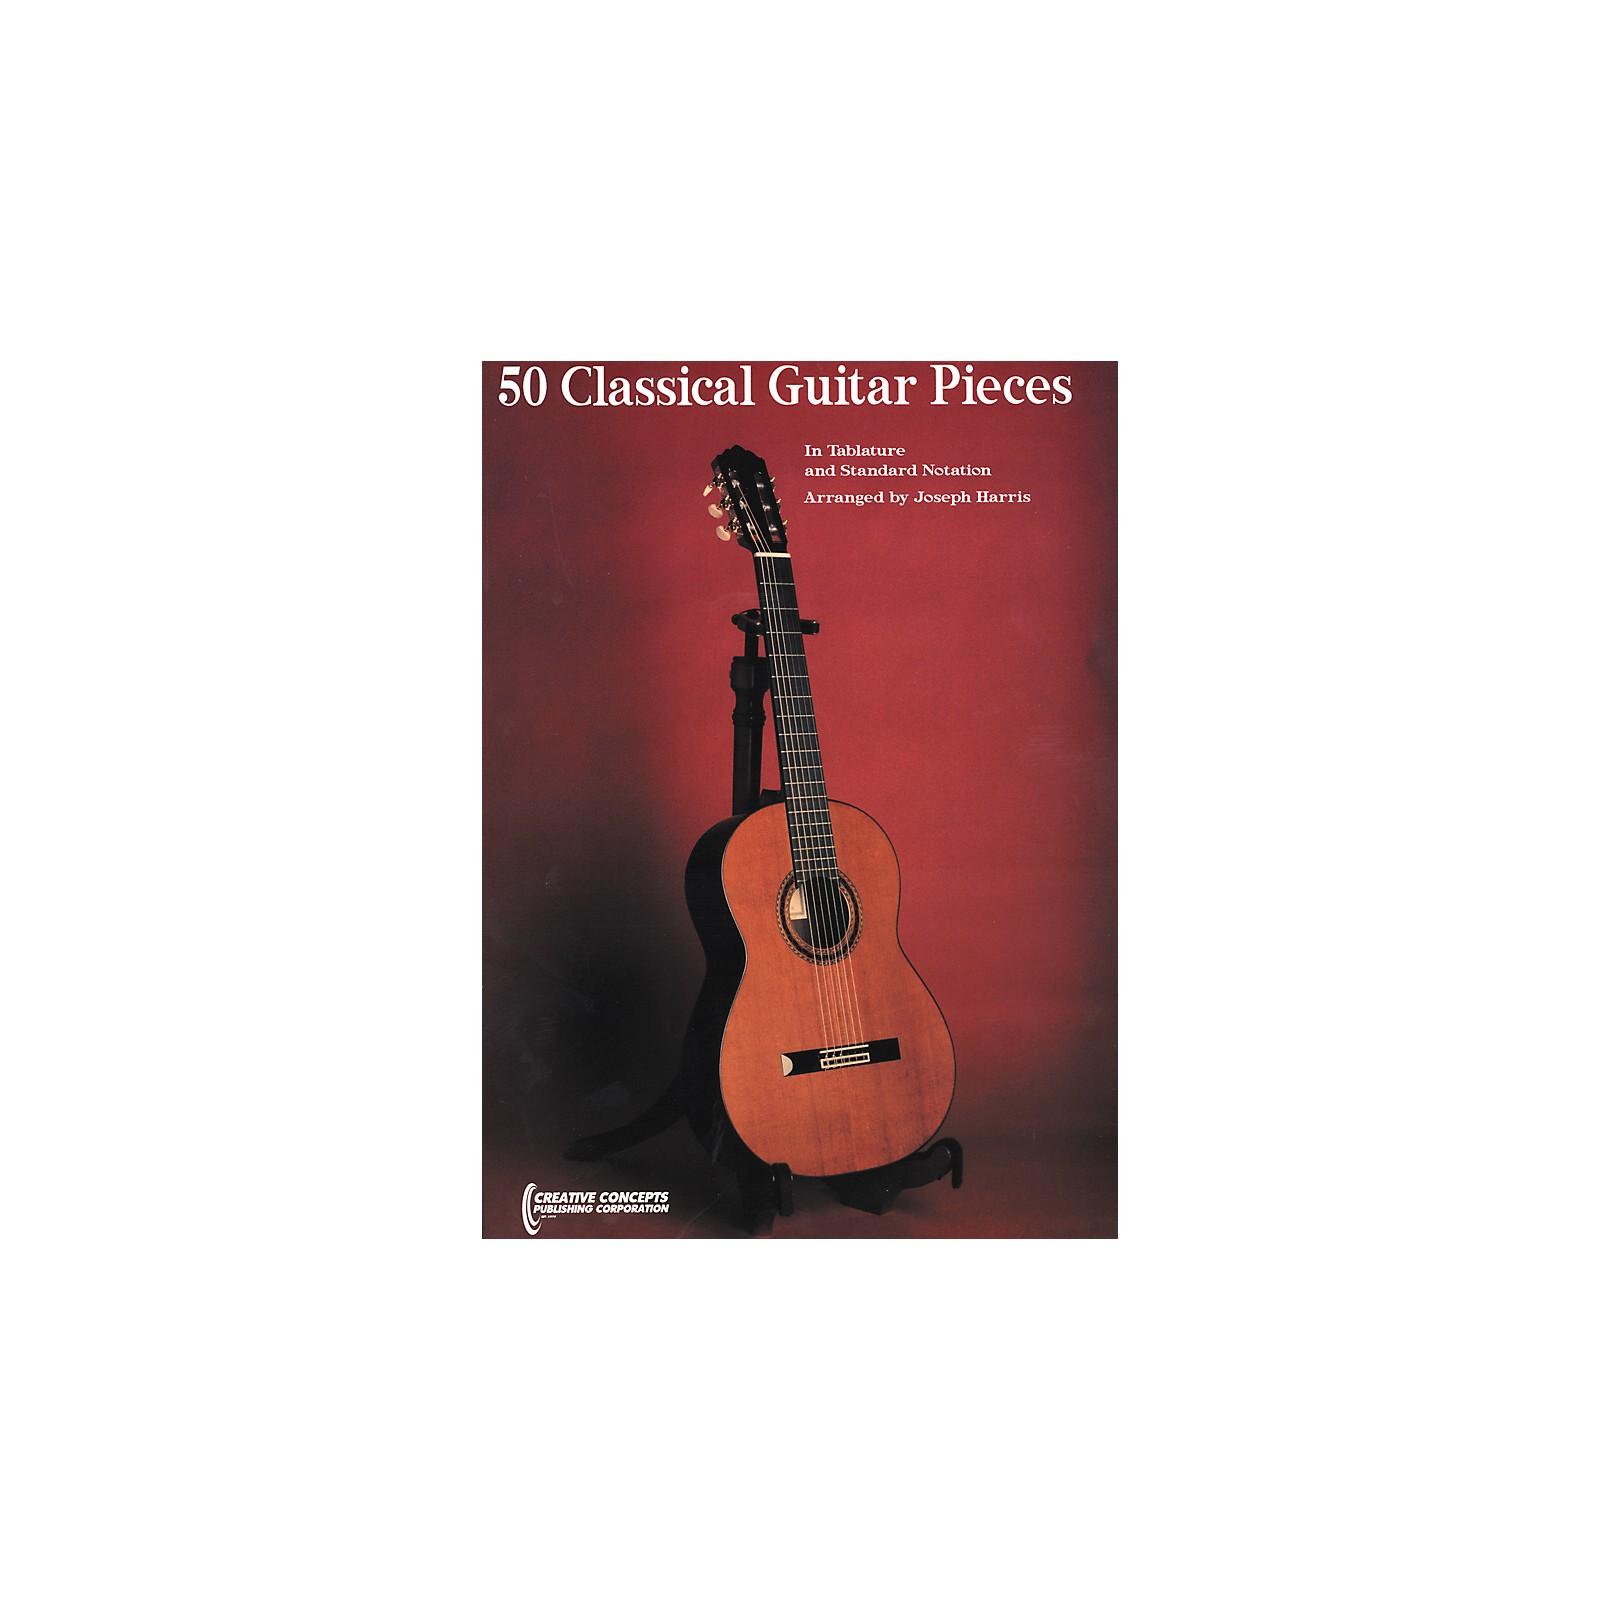 Creative Concepts 50 Classical Guitar Pieces Book